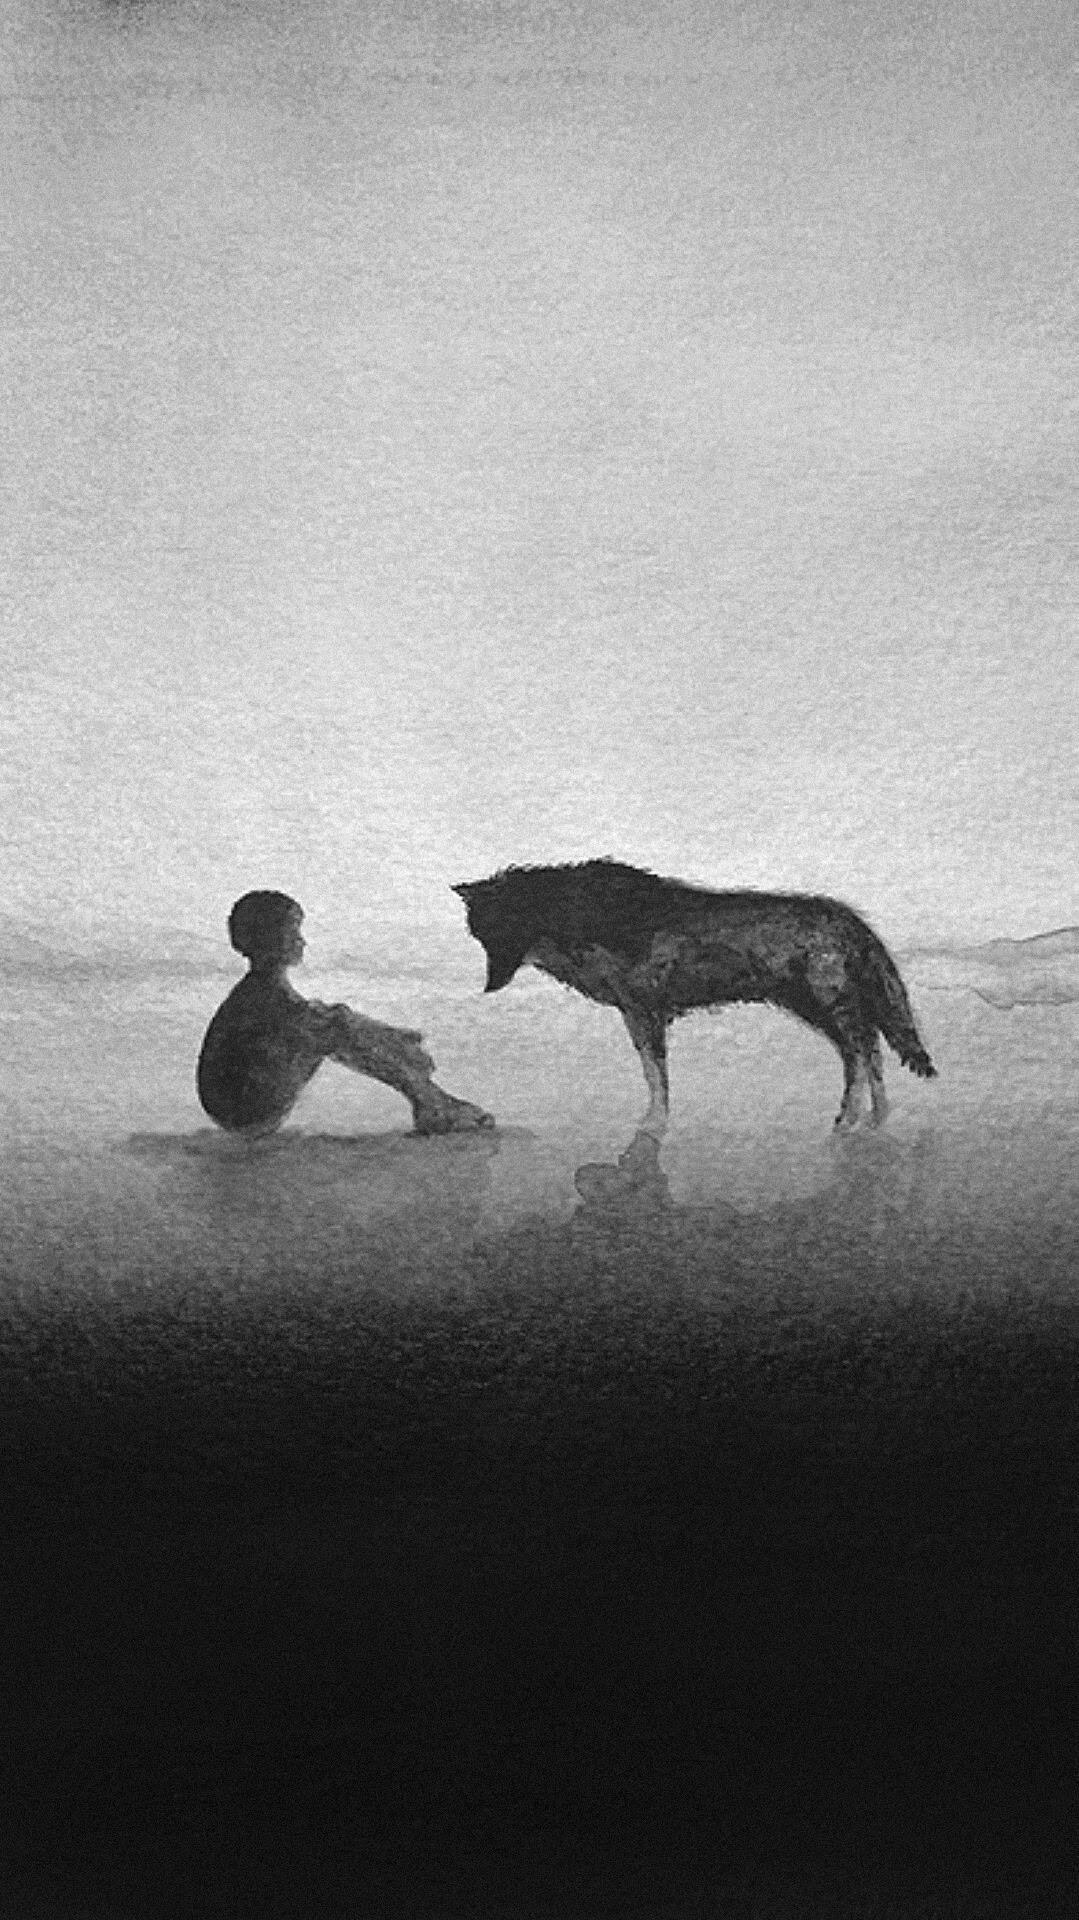 Man vs Wolf